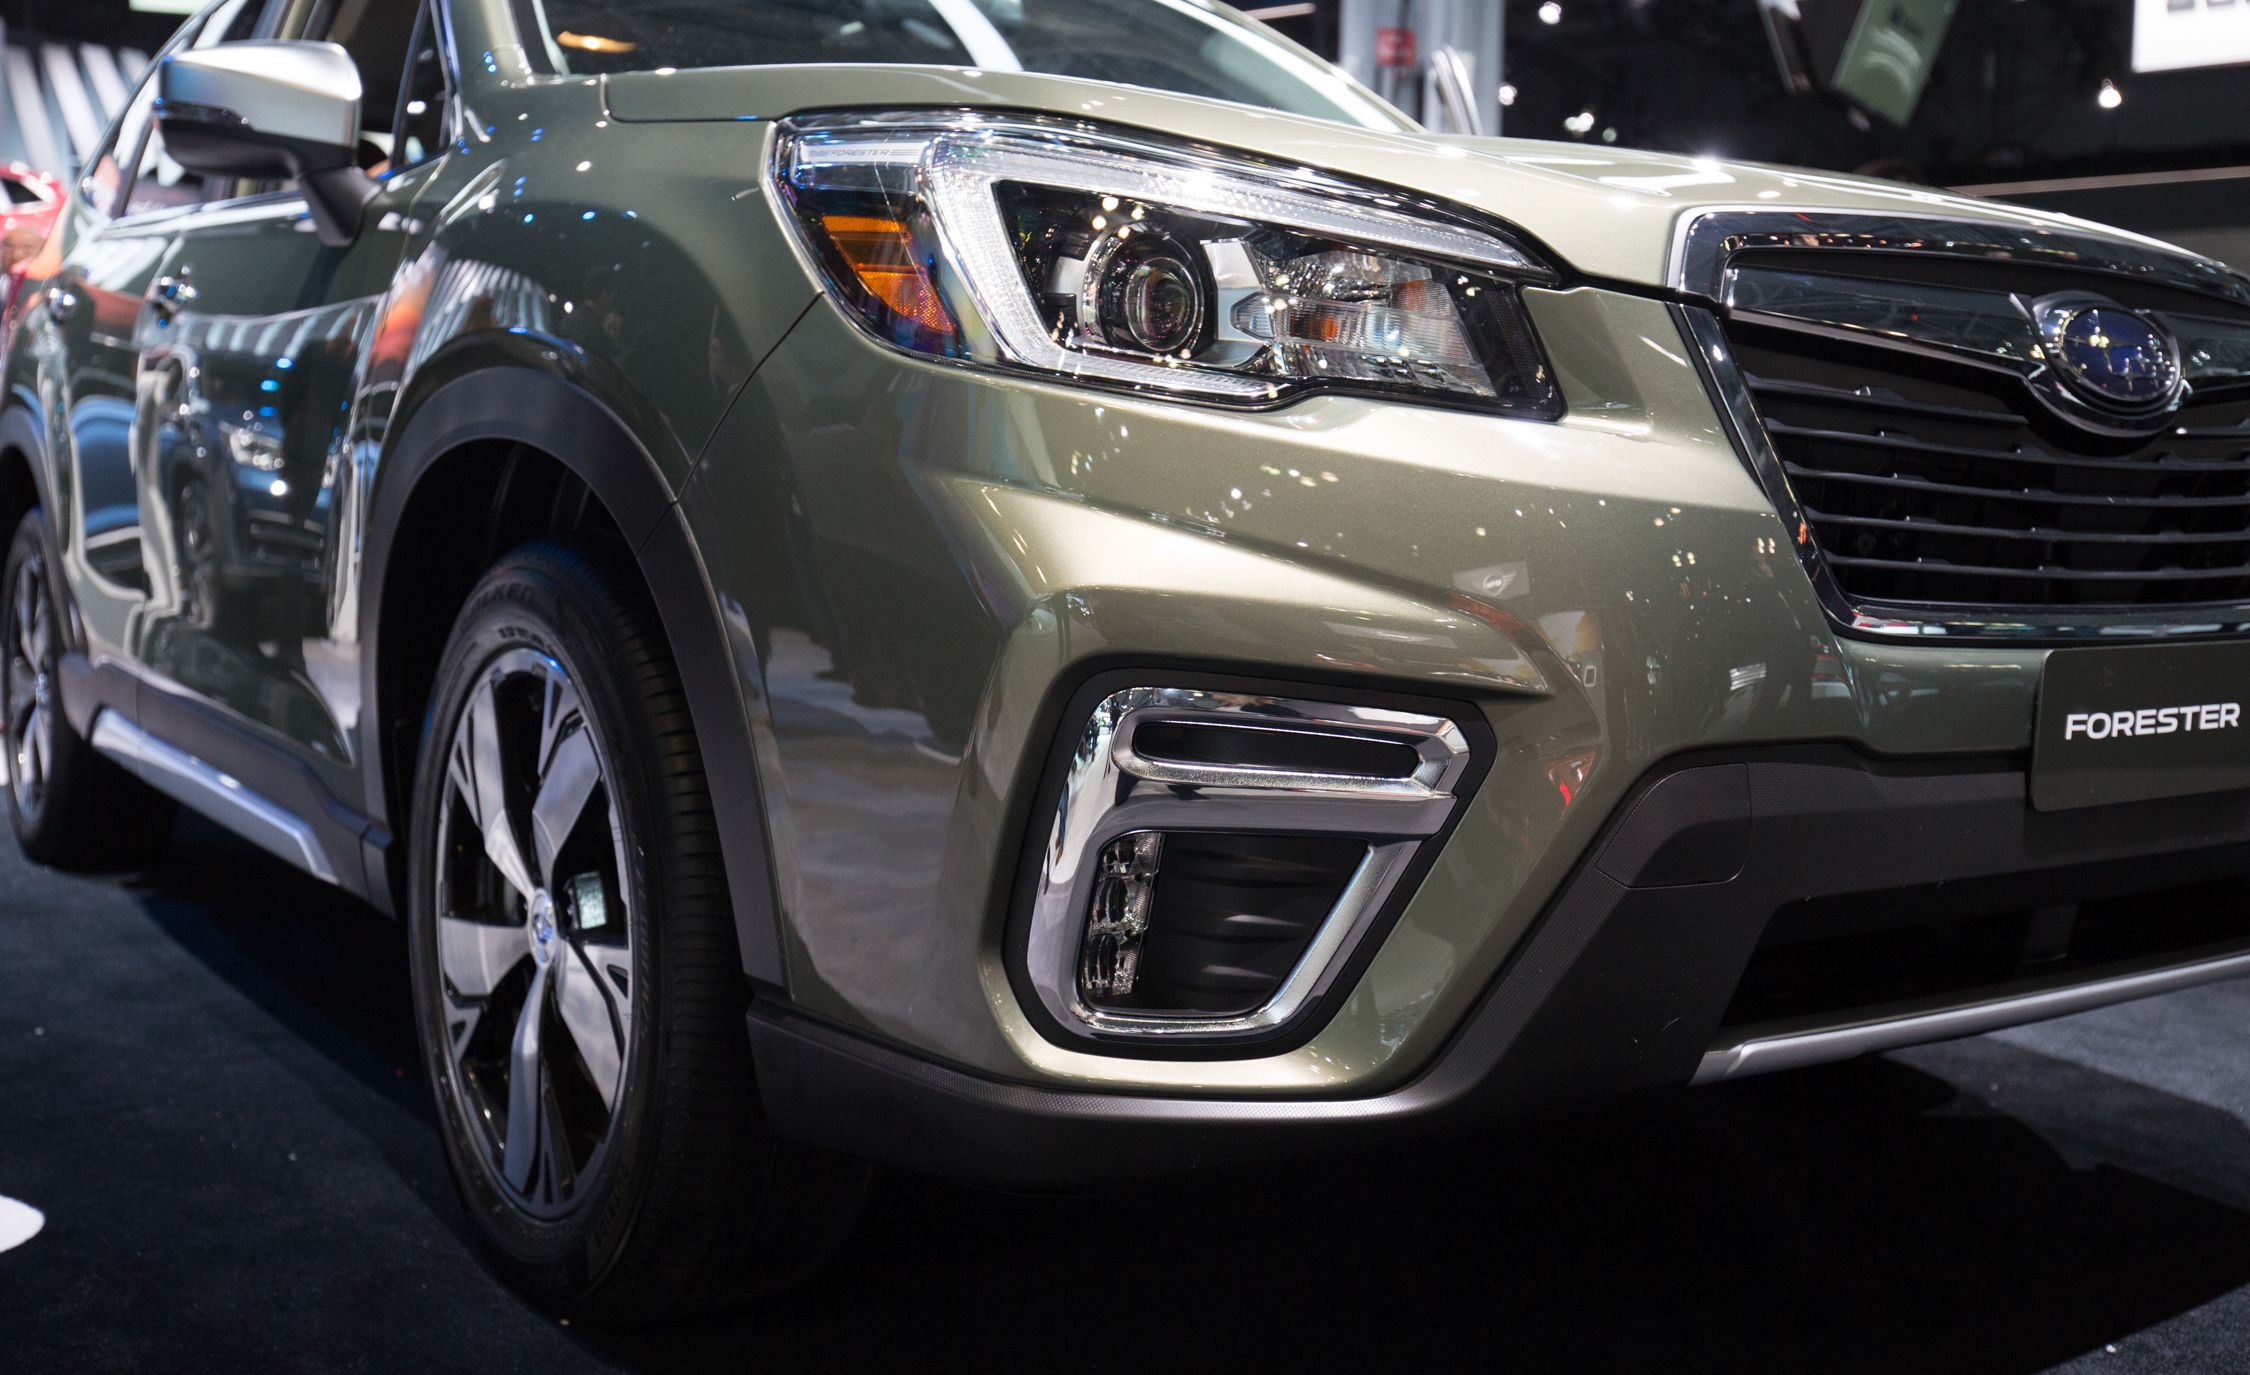 Subaru Forester Reviews Price Photos And Specs Car Driver Cars Jpg 2250x1375